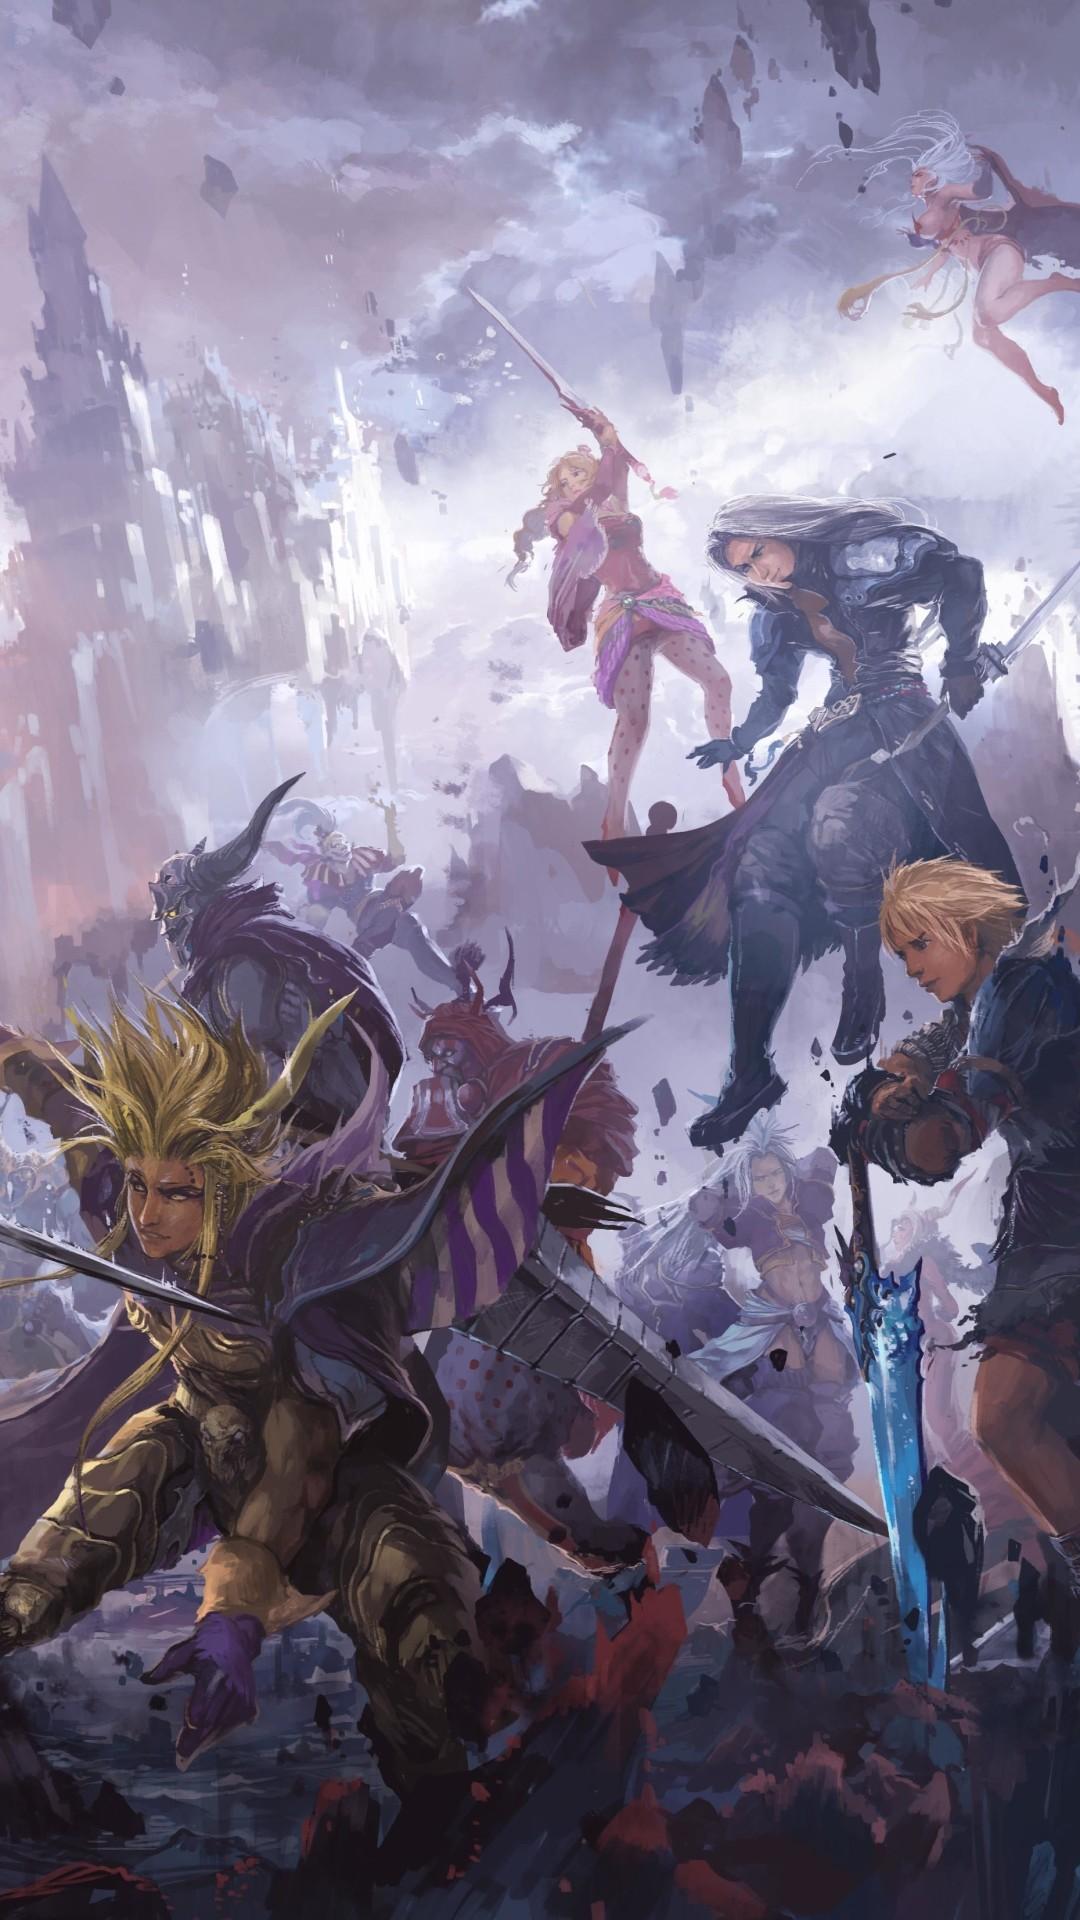 Final fantasy dissidia wallpaper 62 images - Fantasy game wallpaper ...